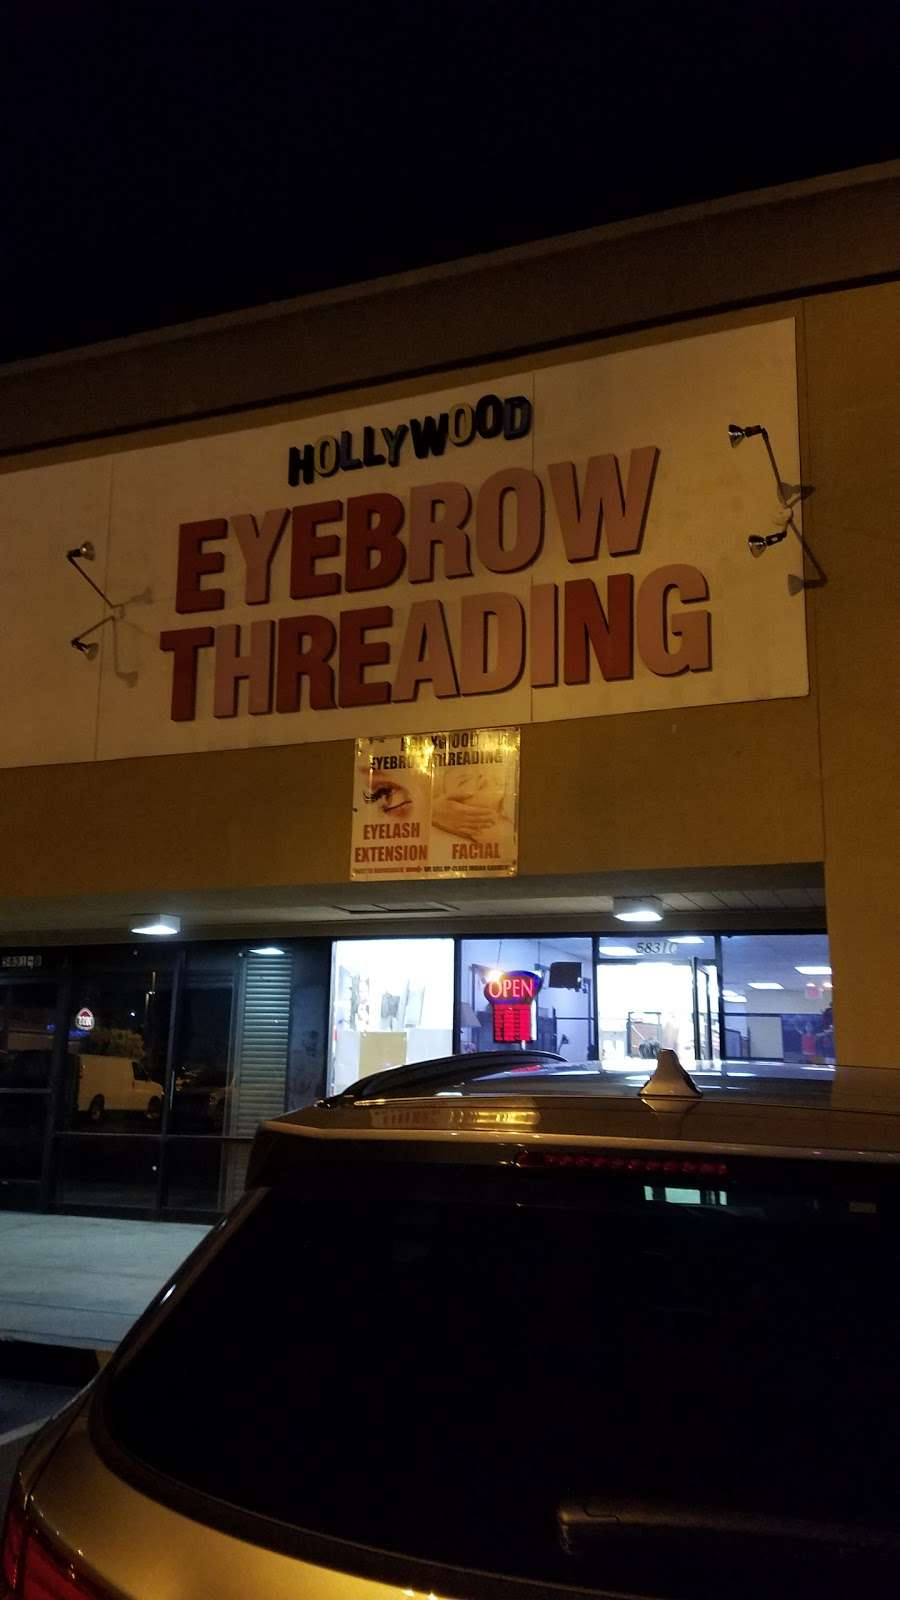 Hollywood Eyebrow Threading - spa  | Photo 2 of 3 | Address: 5831 Firestone Blvd, South Gate, CA 90280, USA | Phone: (714) 369-7441